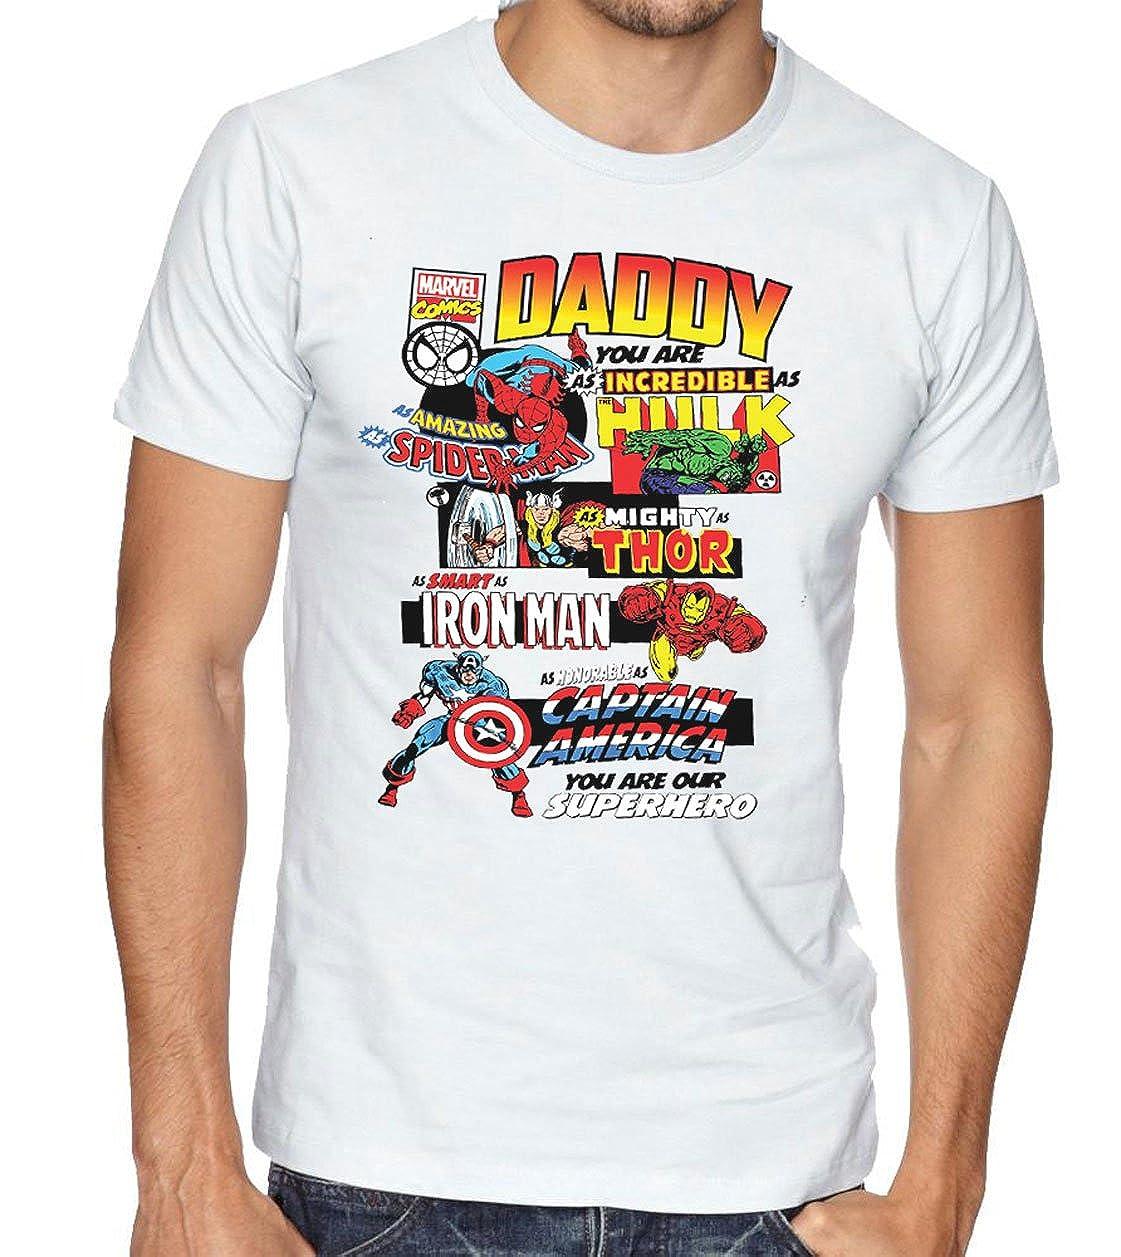 b44baa6c Daddy Marvel Comic Book Style Fathers Day T-Shirt Dad Present Gift Superhero  Tee: Amazon.co.uk: Clothing